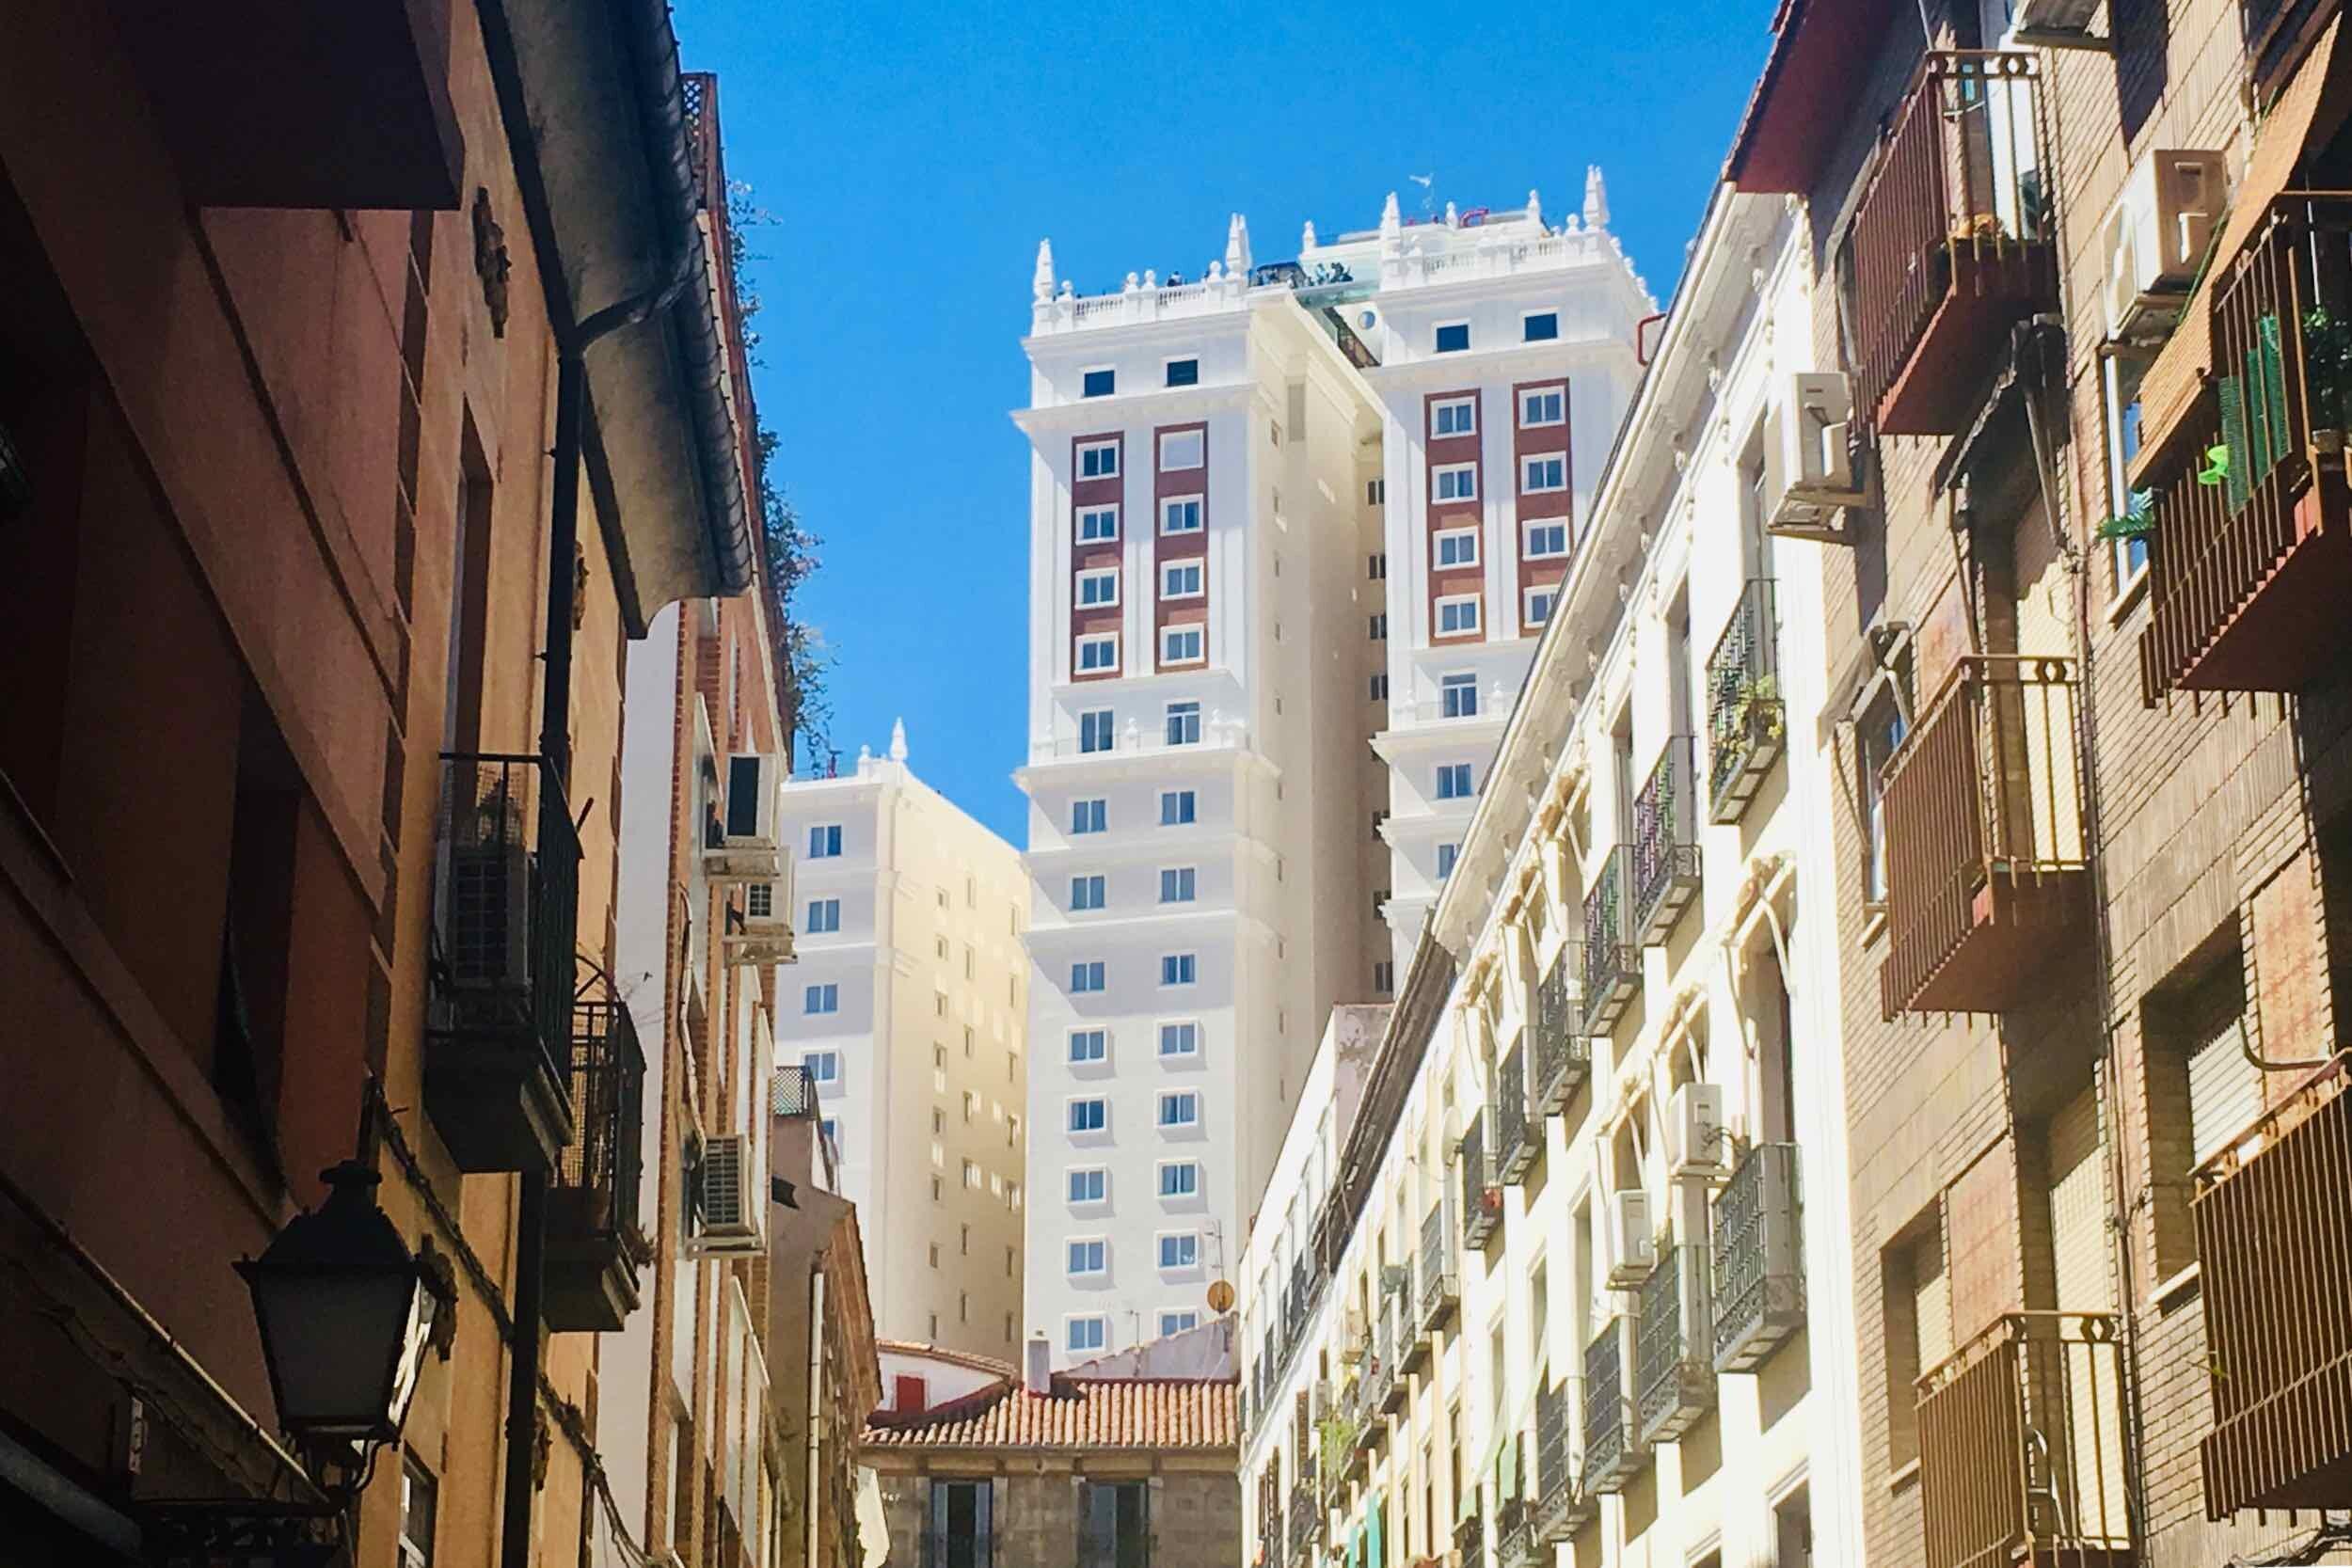 hemels-madrid-malasaña-edificio-españa.jpg